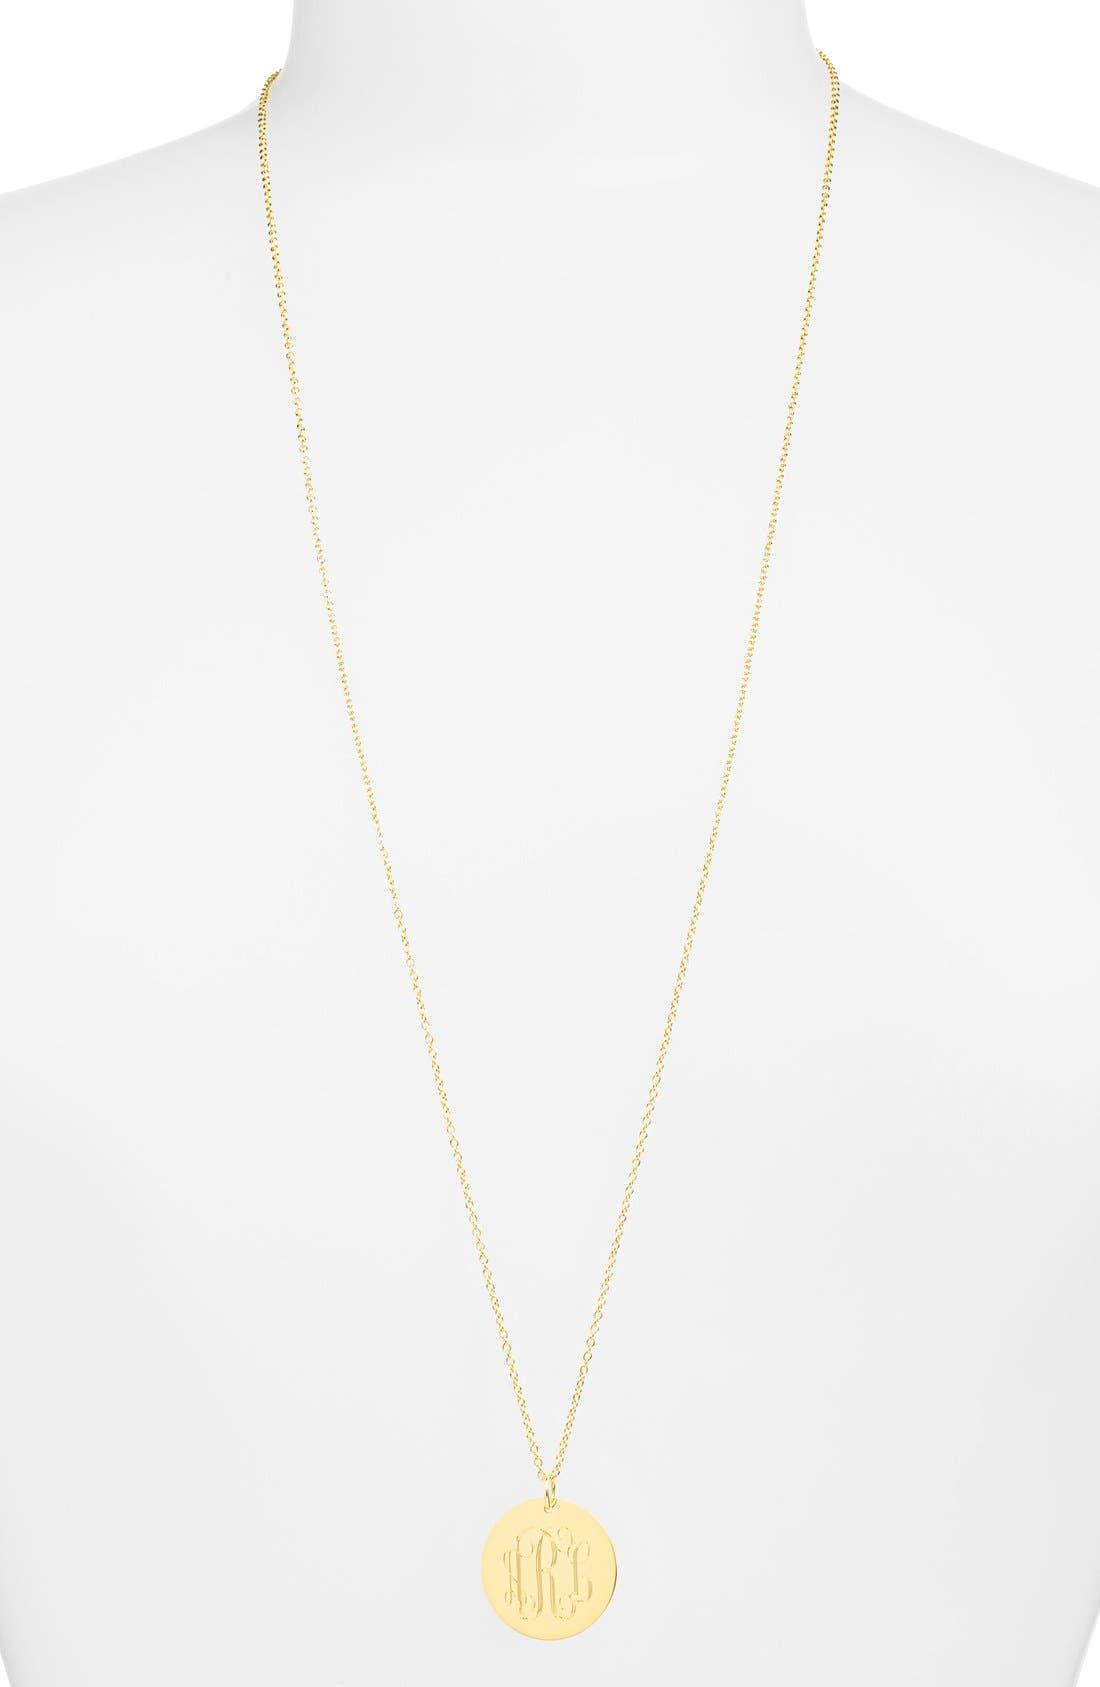 Personalized Reversible Pendant Necklace,                             Alternate thumbnail 3, color,                             Gold